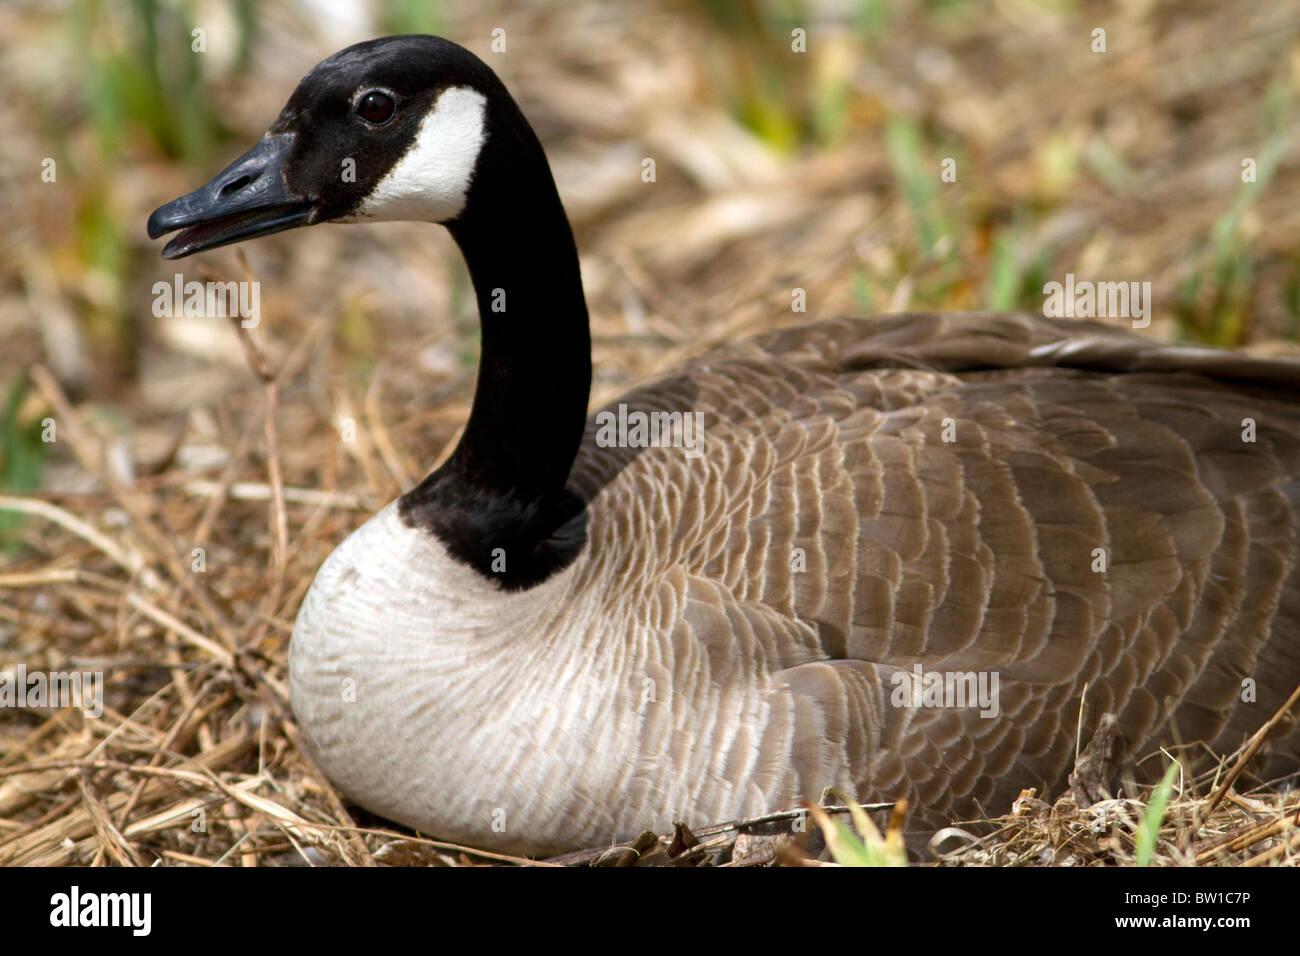 Canada goose nesting on the Boise River in Boise, Idaho, USA. - Stock Image